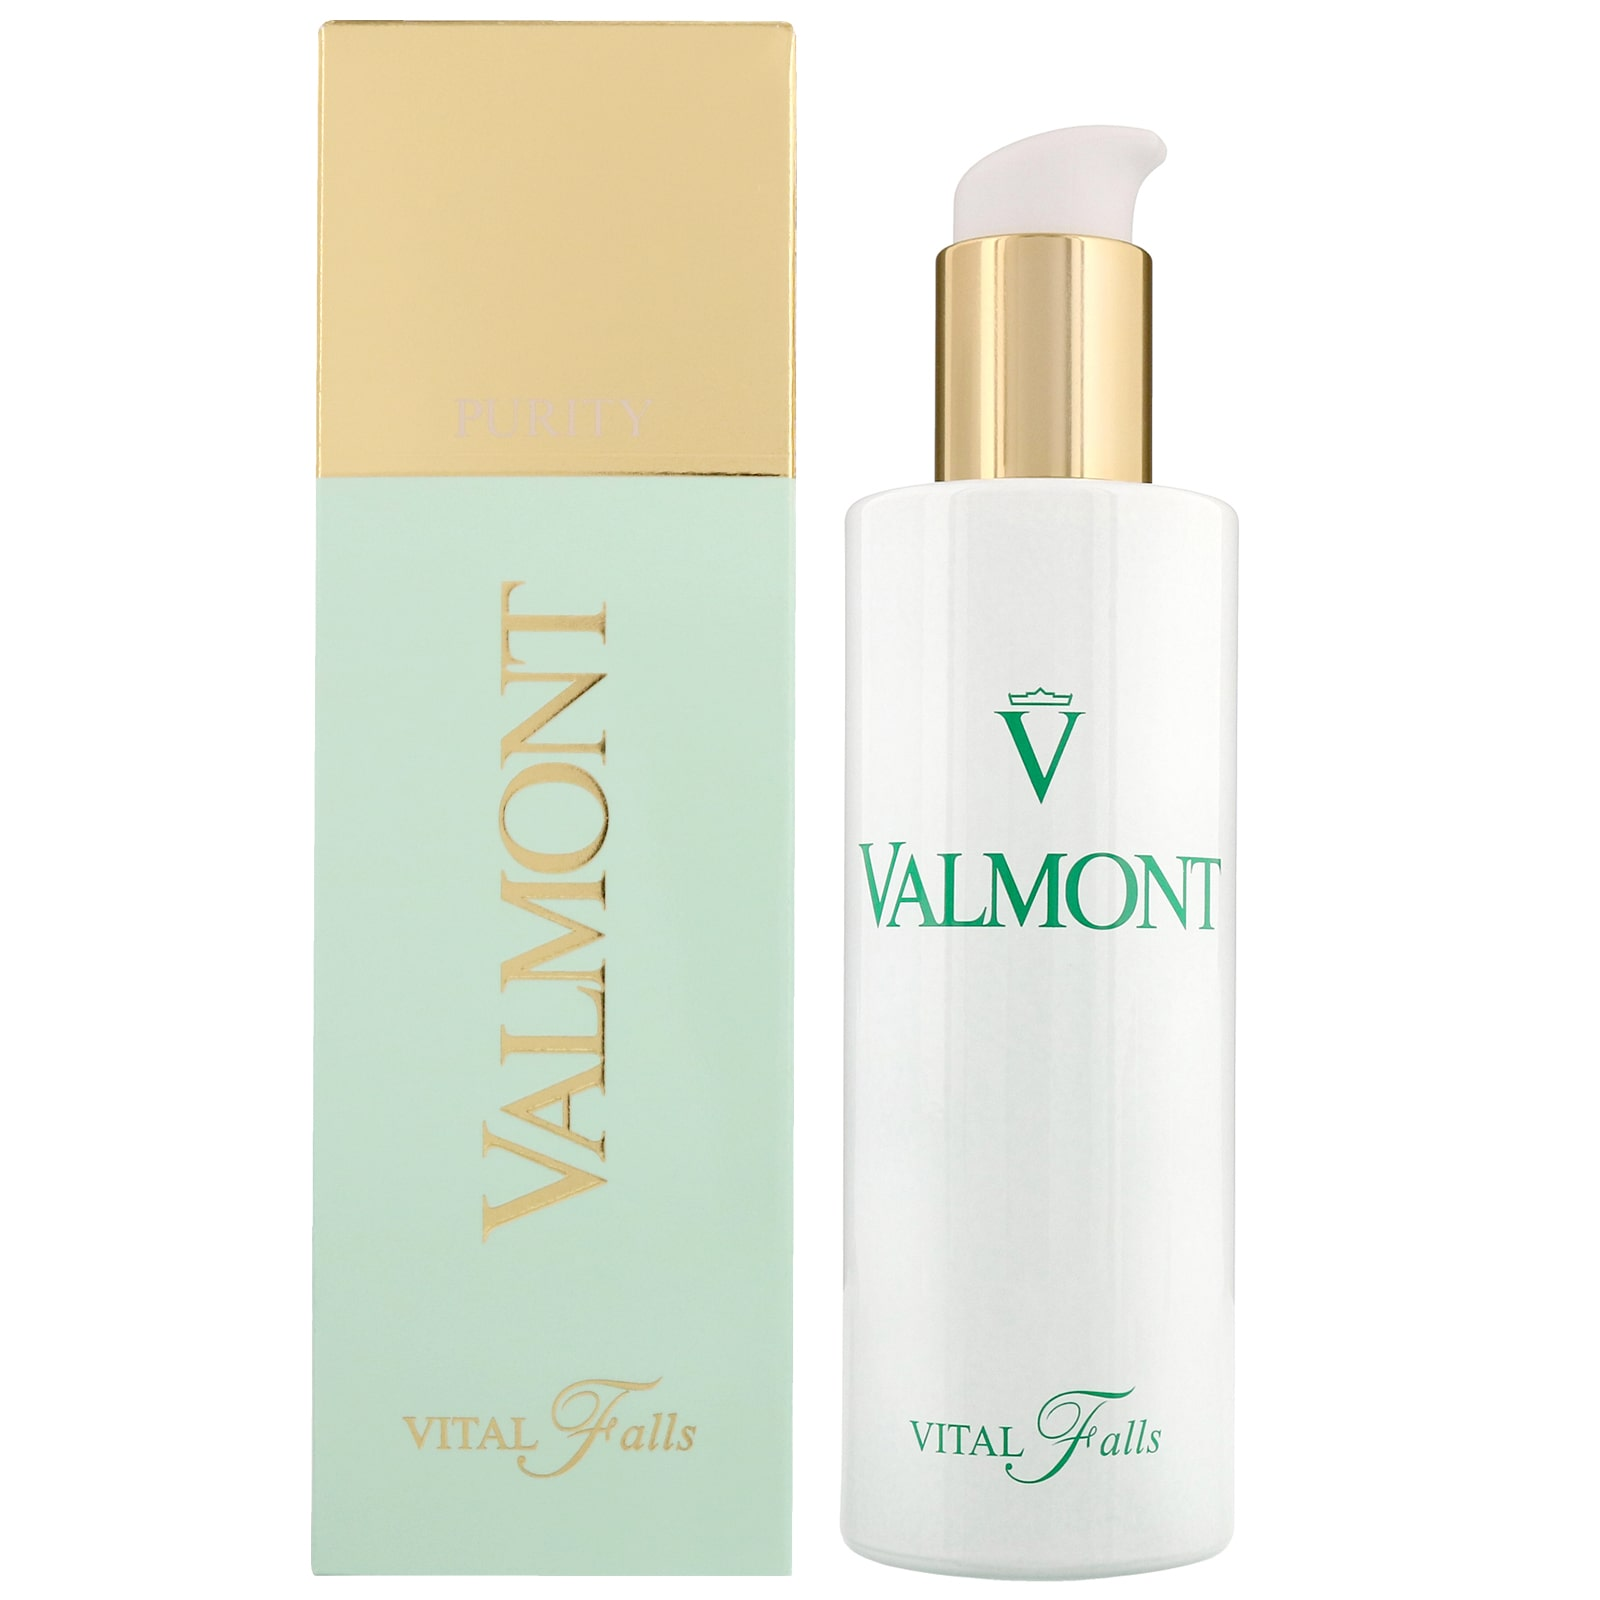 Toner Valmont vital falls